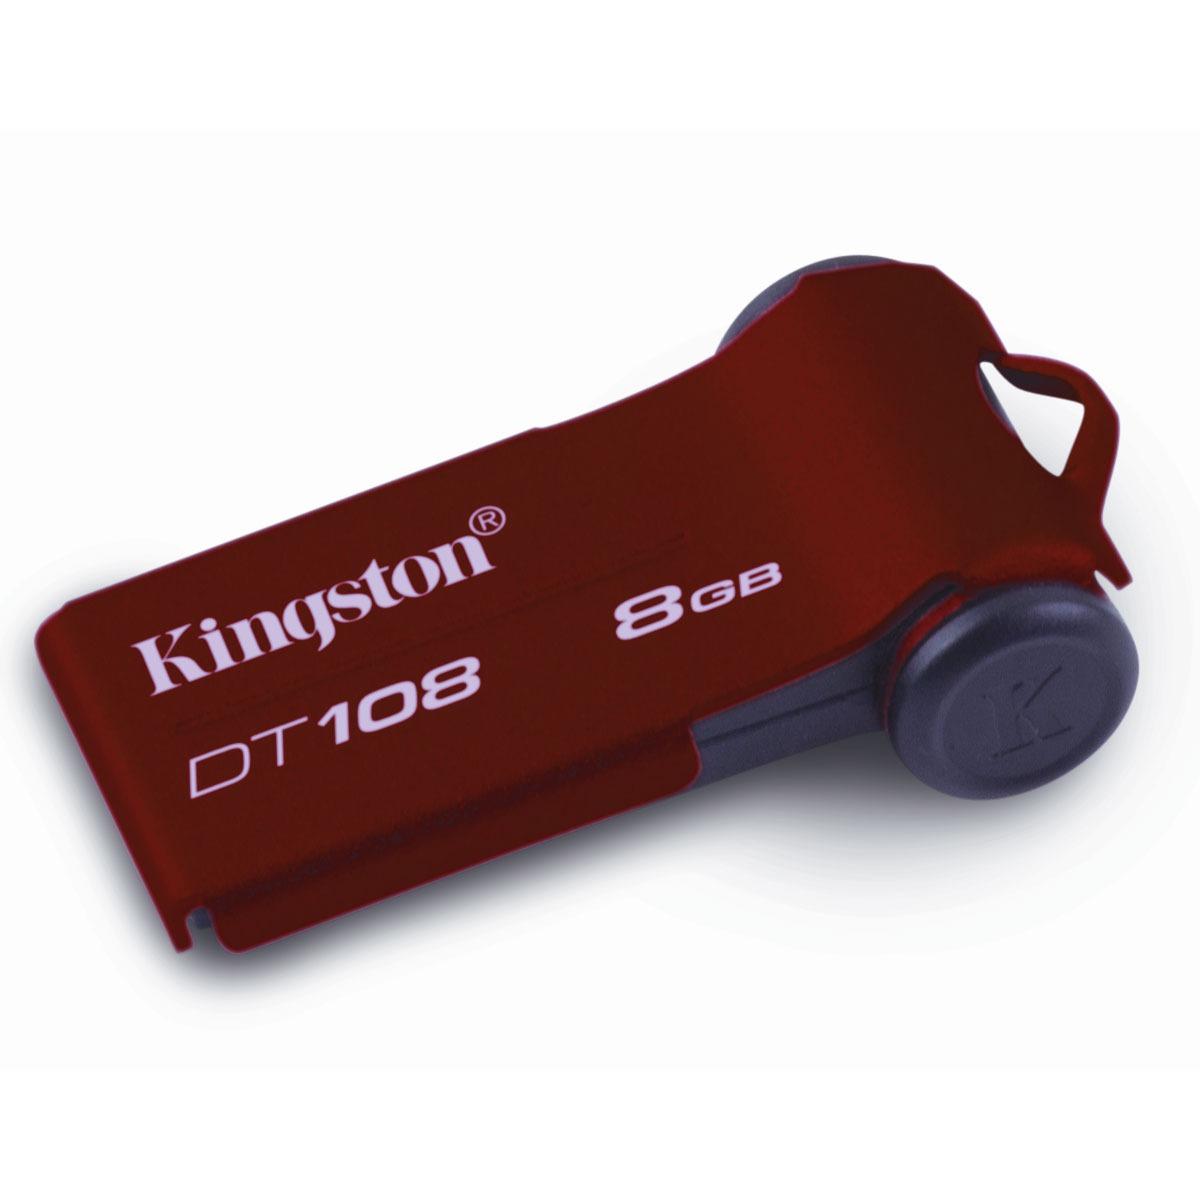 Clé USB Kingston DataTraveler 108 8 Go Kingston DataTraveler 108 8 Go - USB 2.0 (garantie constructeur 5 ans)